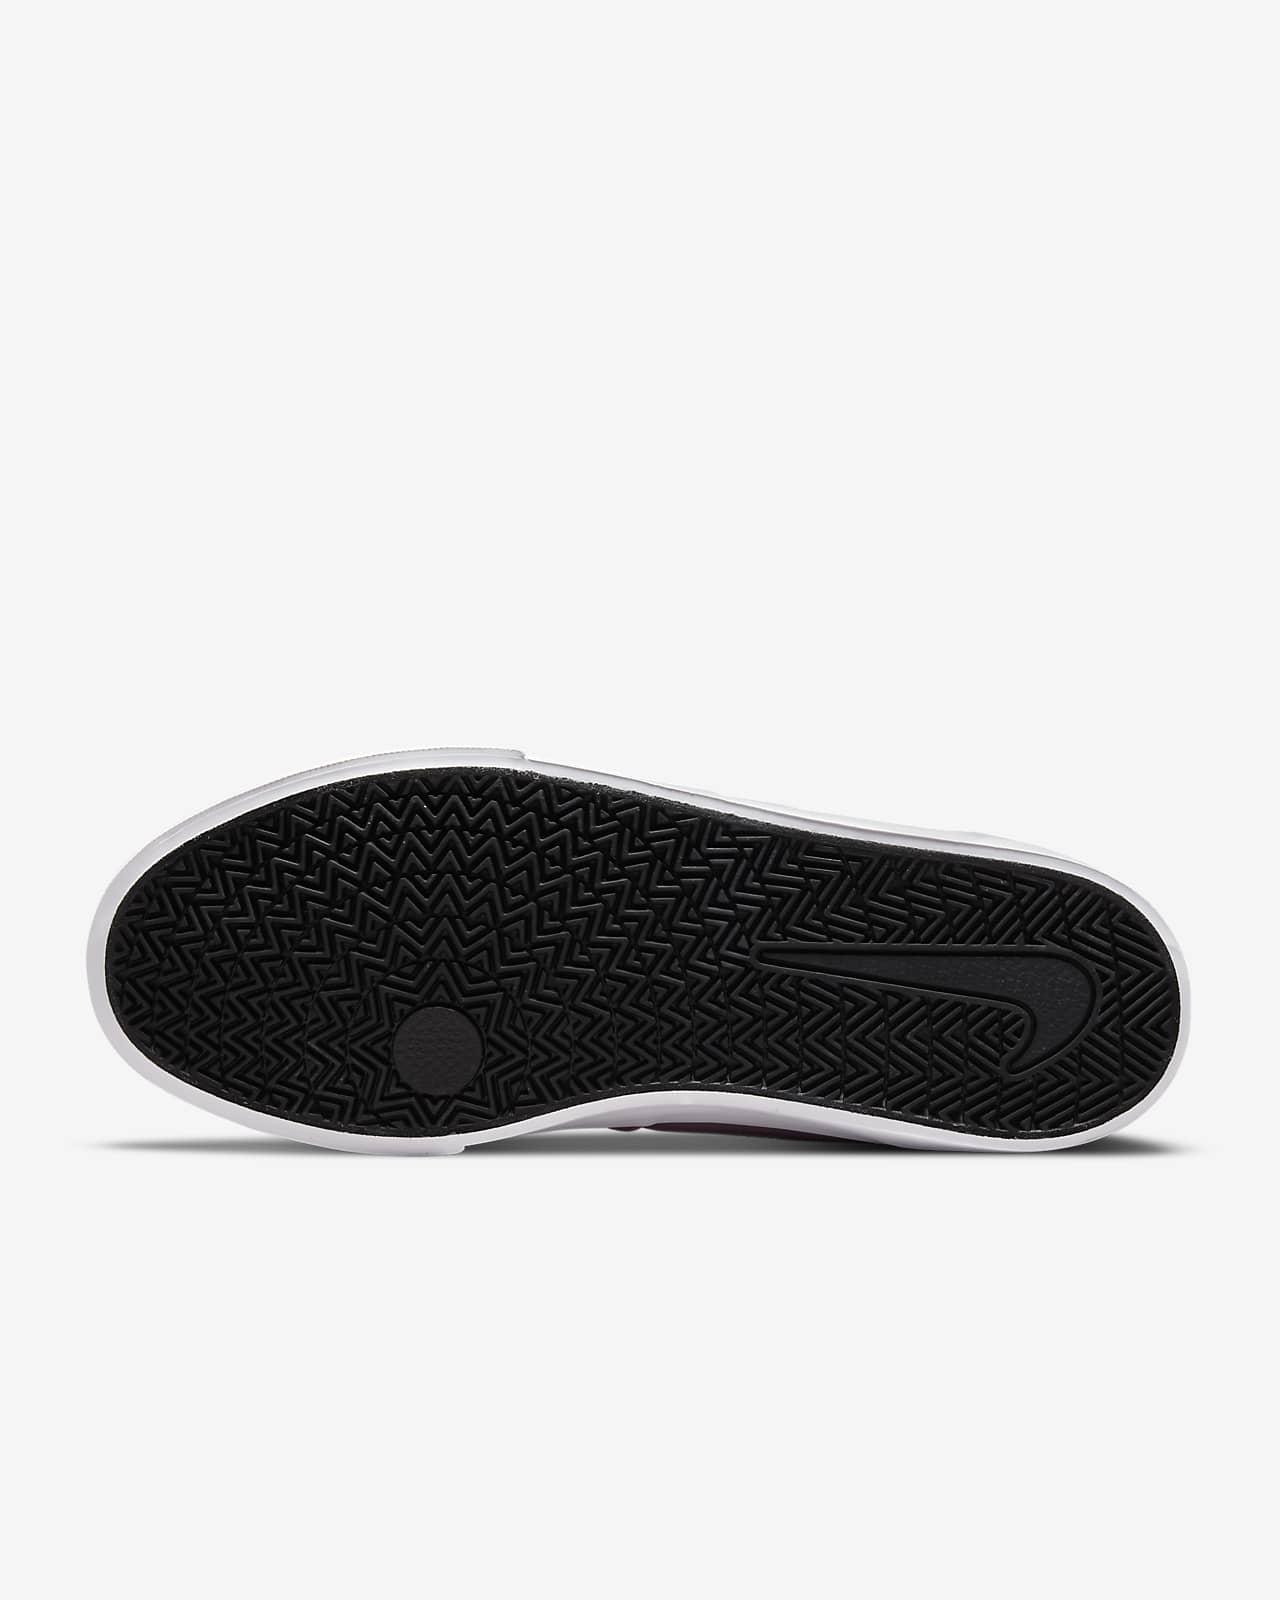 Chaussure de skateboard Nike SB Charge Suede pour Femme